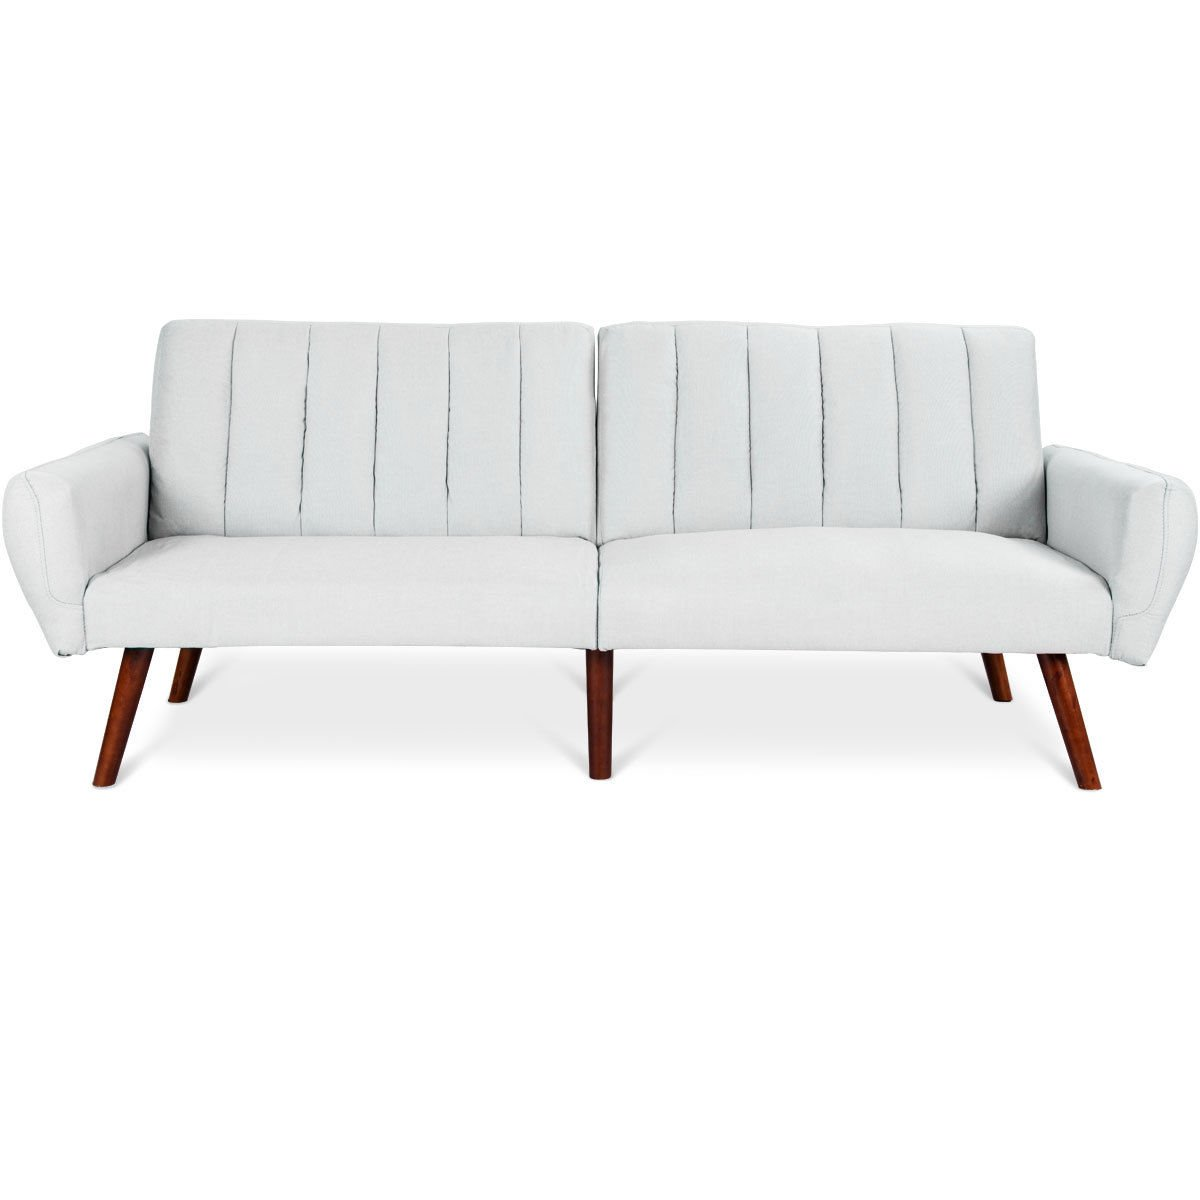 Amazon.com: GHP 600-Lbs Capacity Gray Linen Wood Frame 5 ...